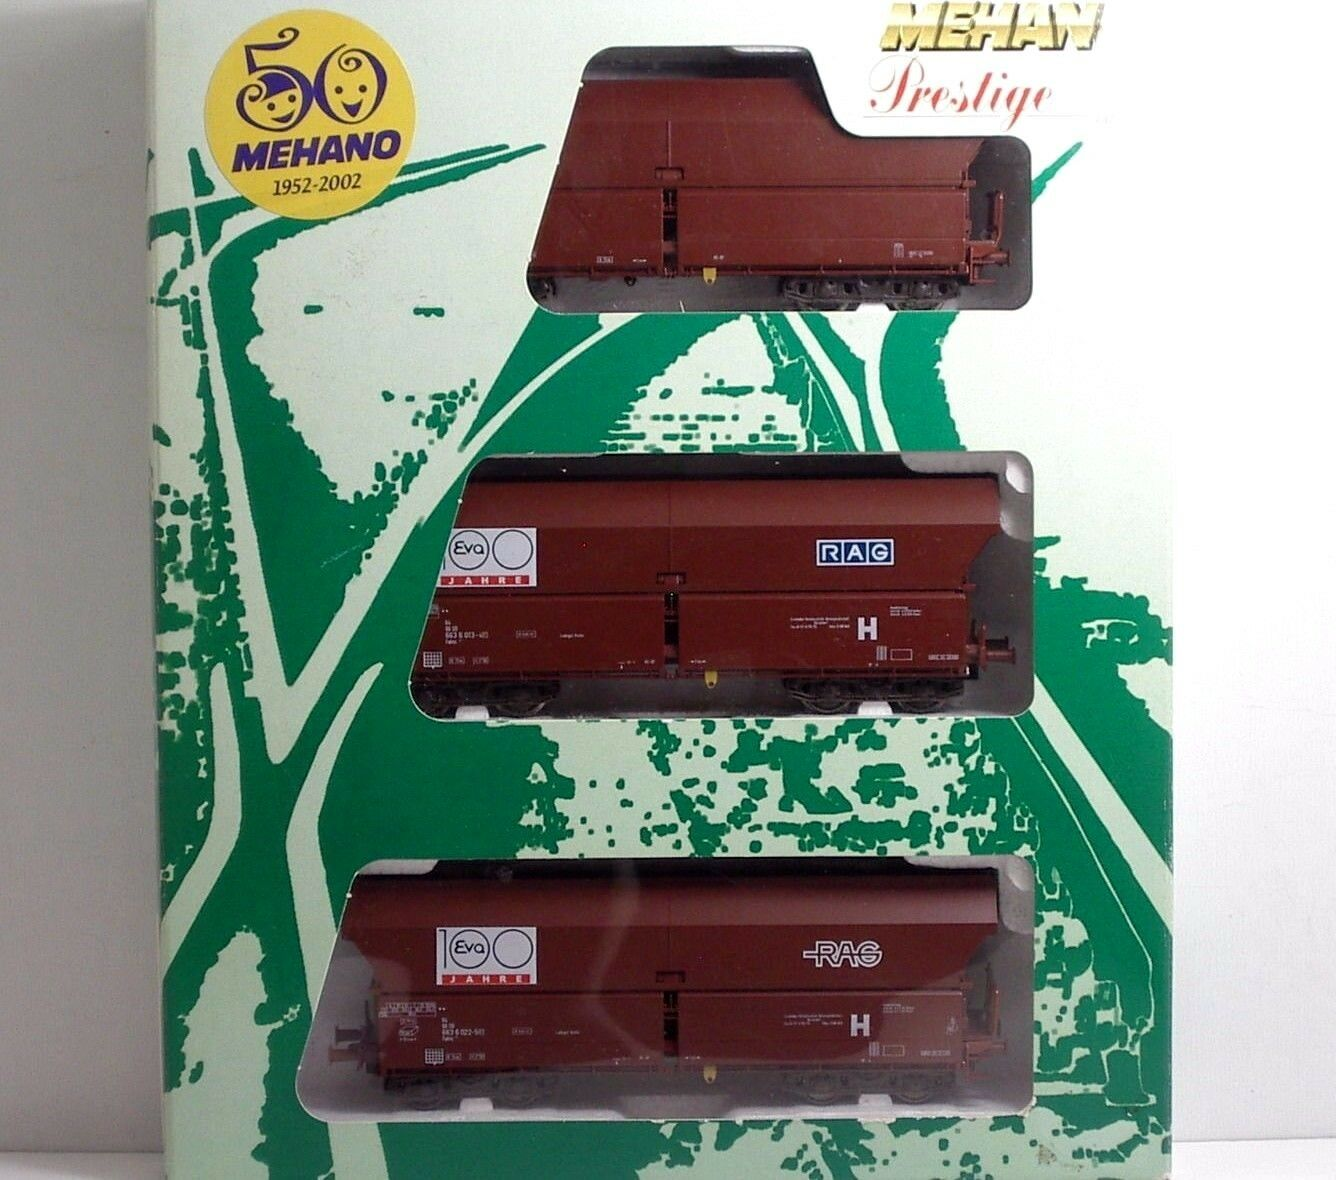 ofrecemos varias marcas famosas Mehano Mehano Mehano T615 DB SET Selbstentladewagen 3Pz  EVA   RAG  Ep V  alta calidad